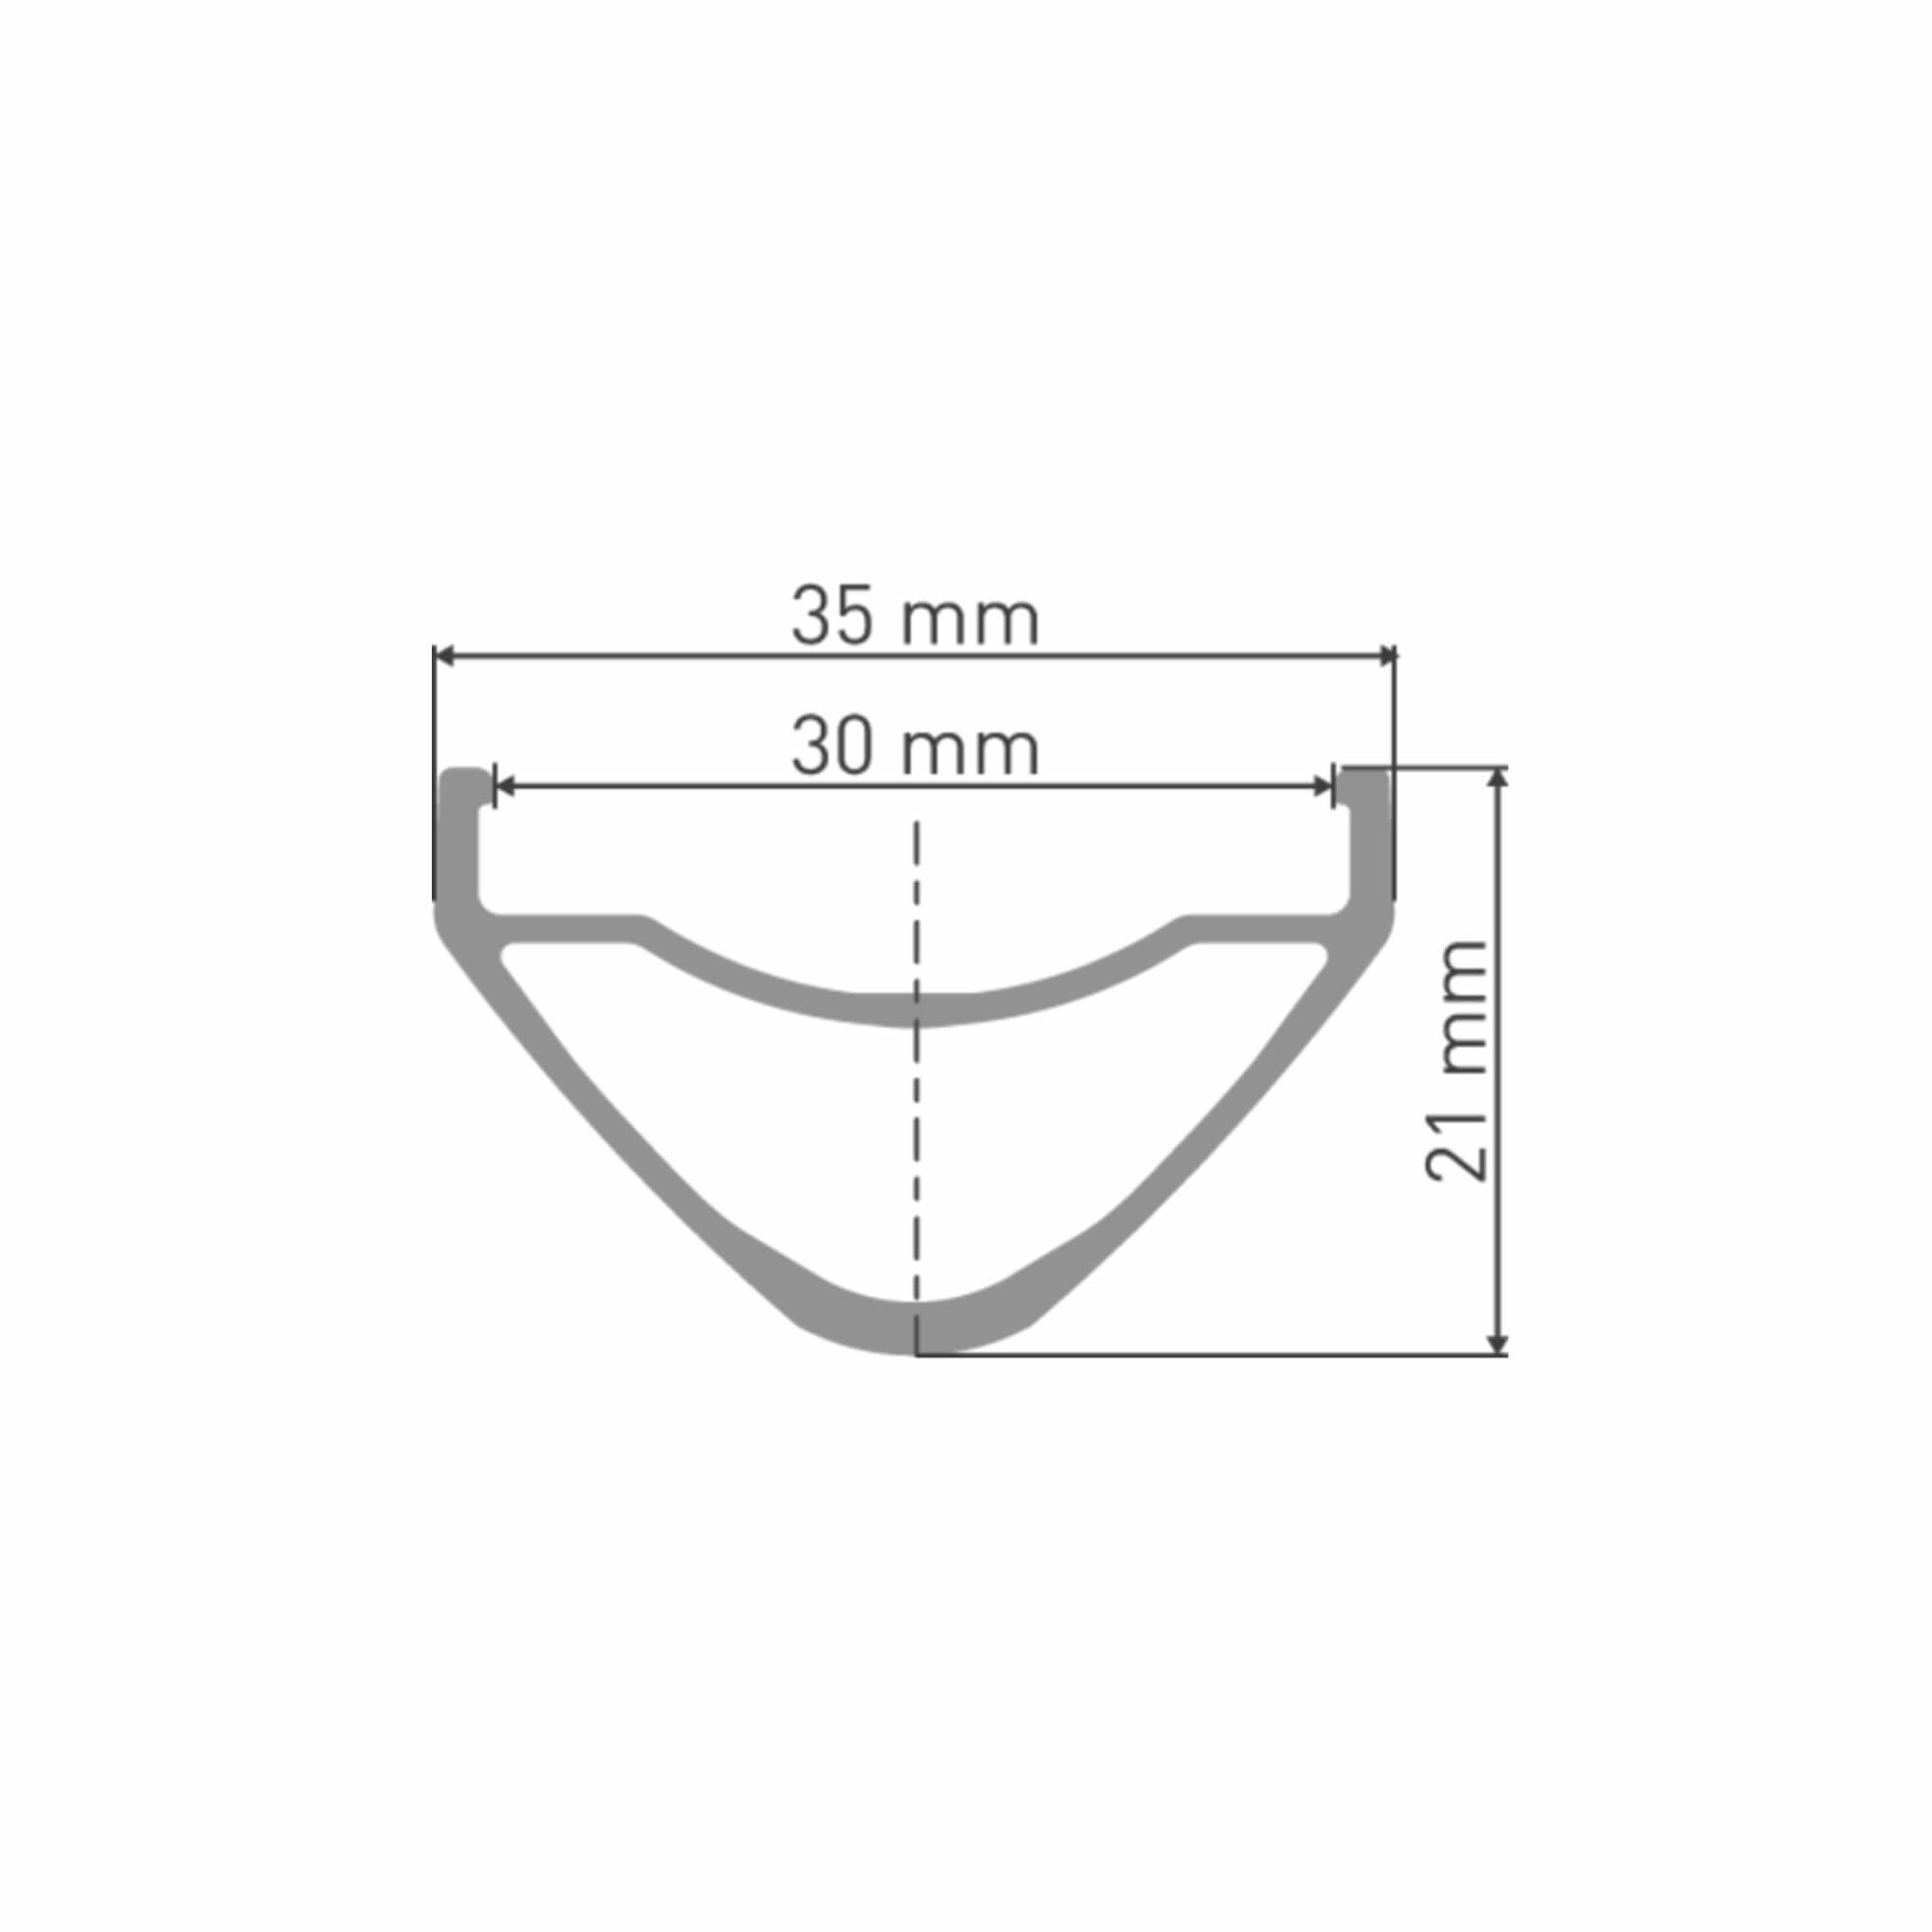 HX1501 Spline 27.5 15110 CL/6B Front-2